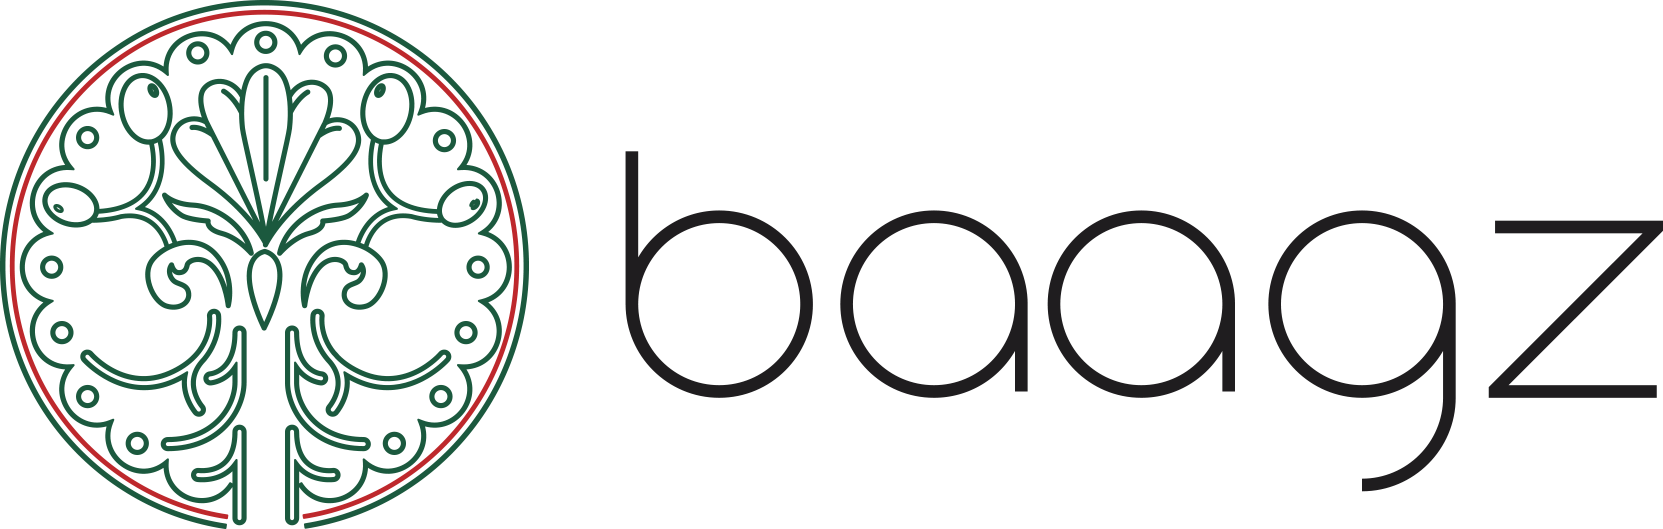 Baagz